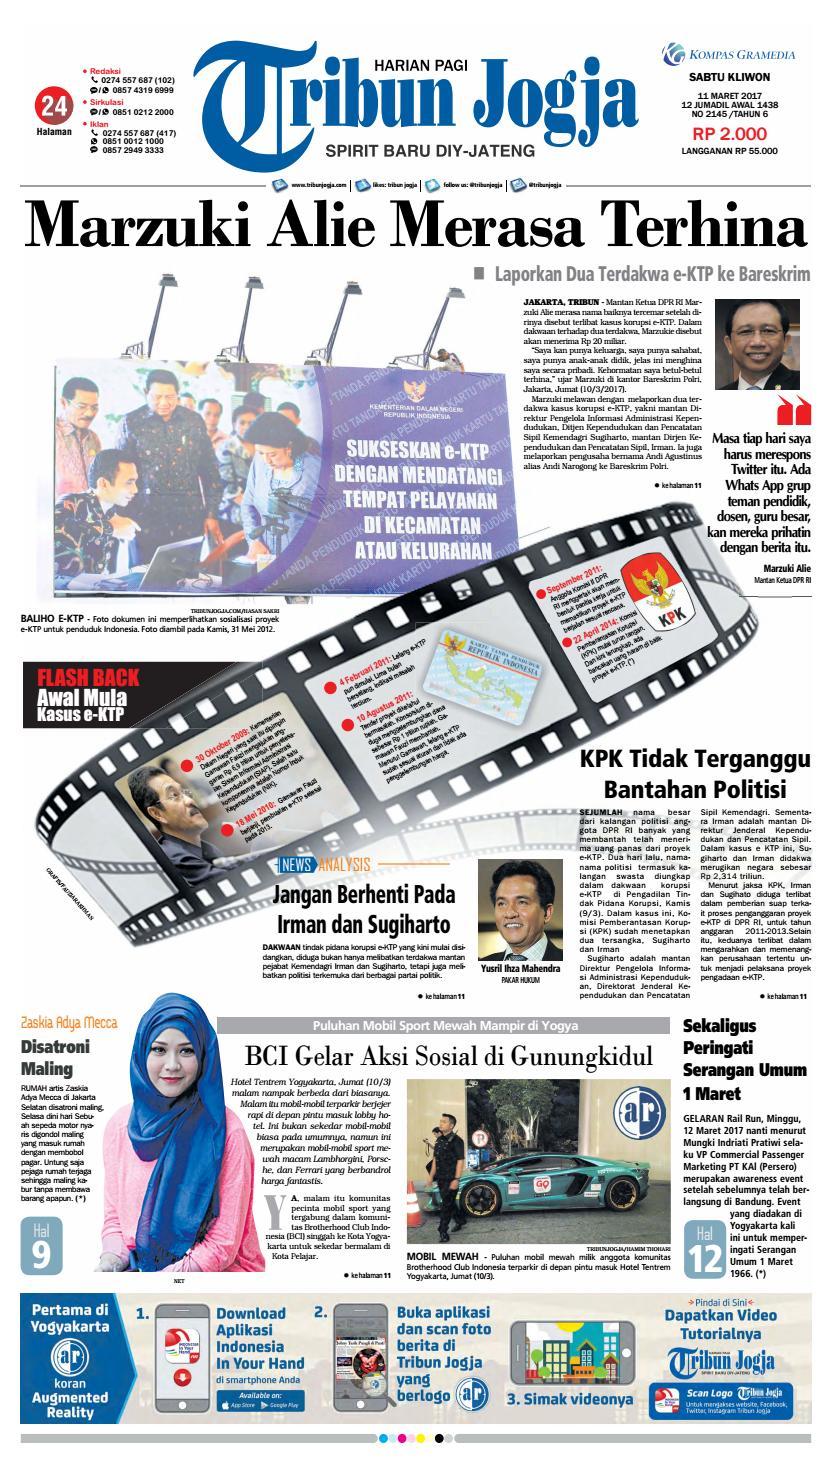 Tribunjogja 11 03 2017 By Tribun Jogja Issuu Produk Ukm Bumn Bakso Ikan Tuna Khas Ambon